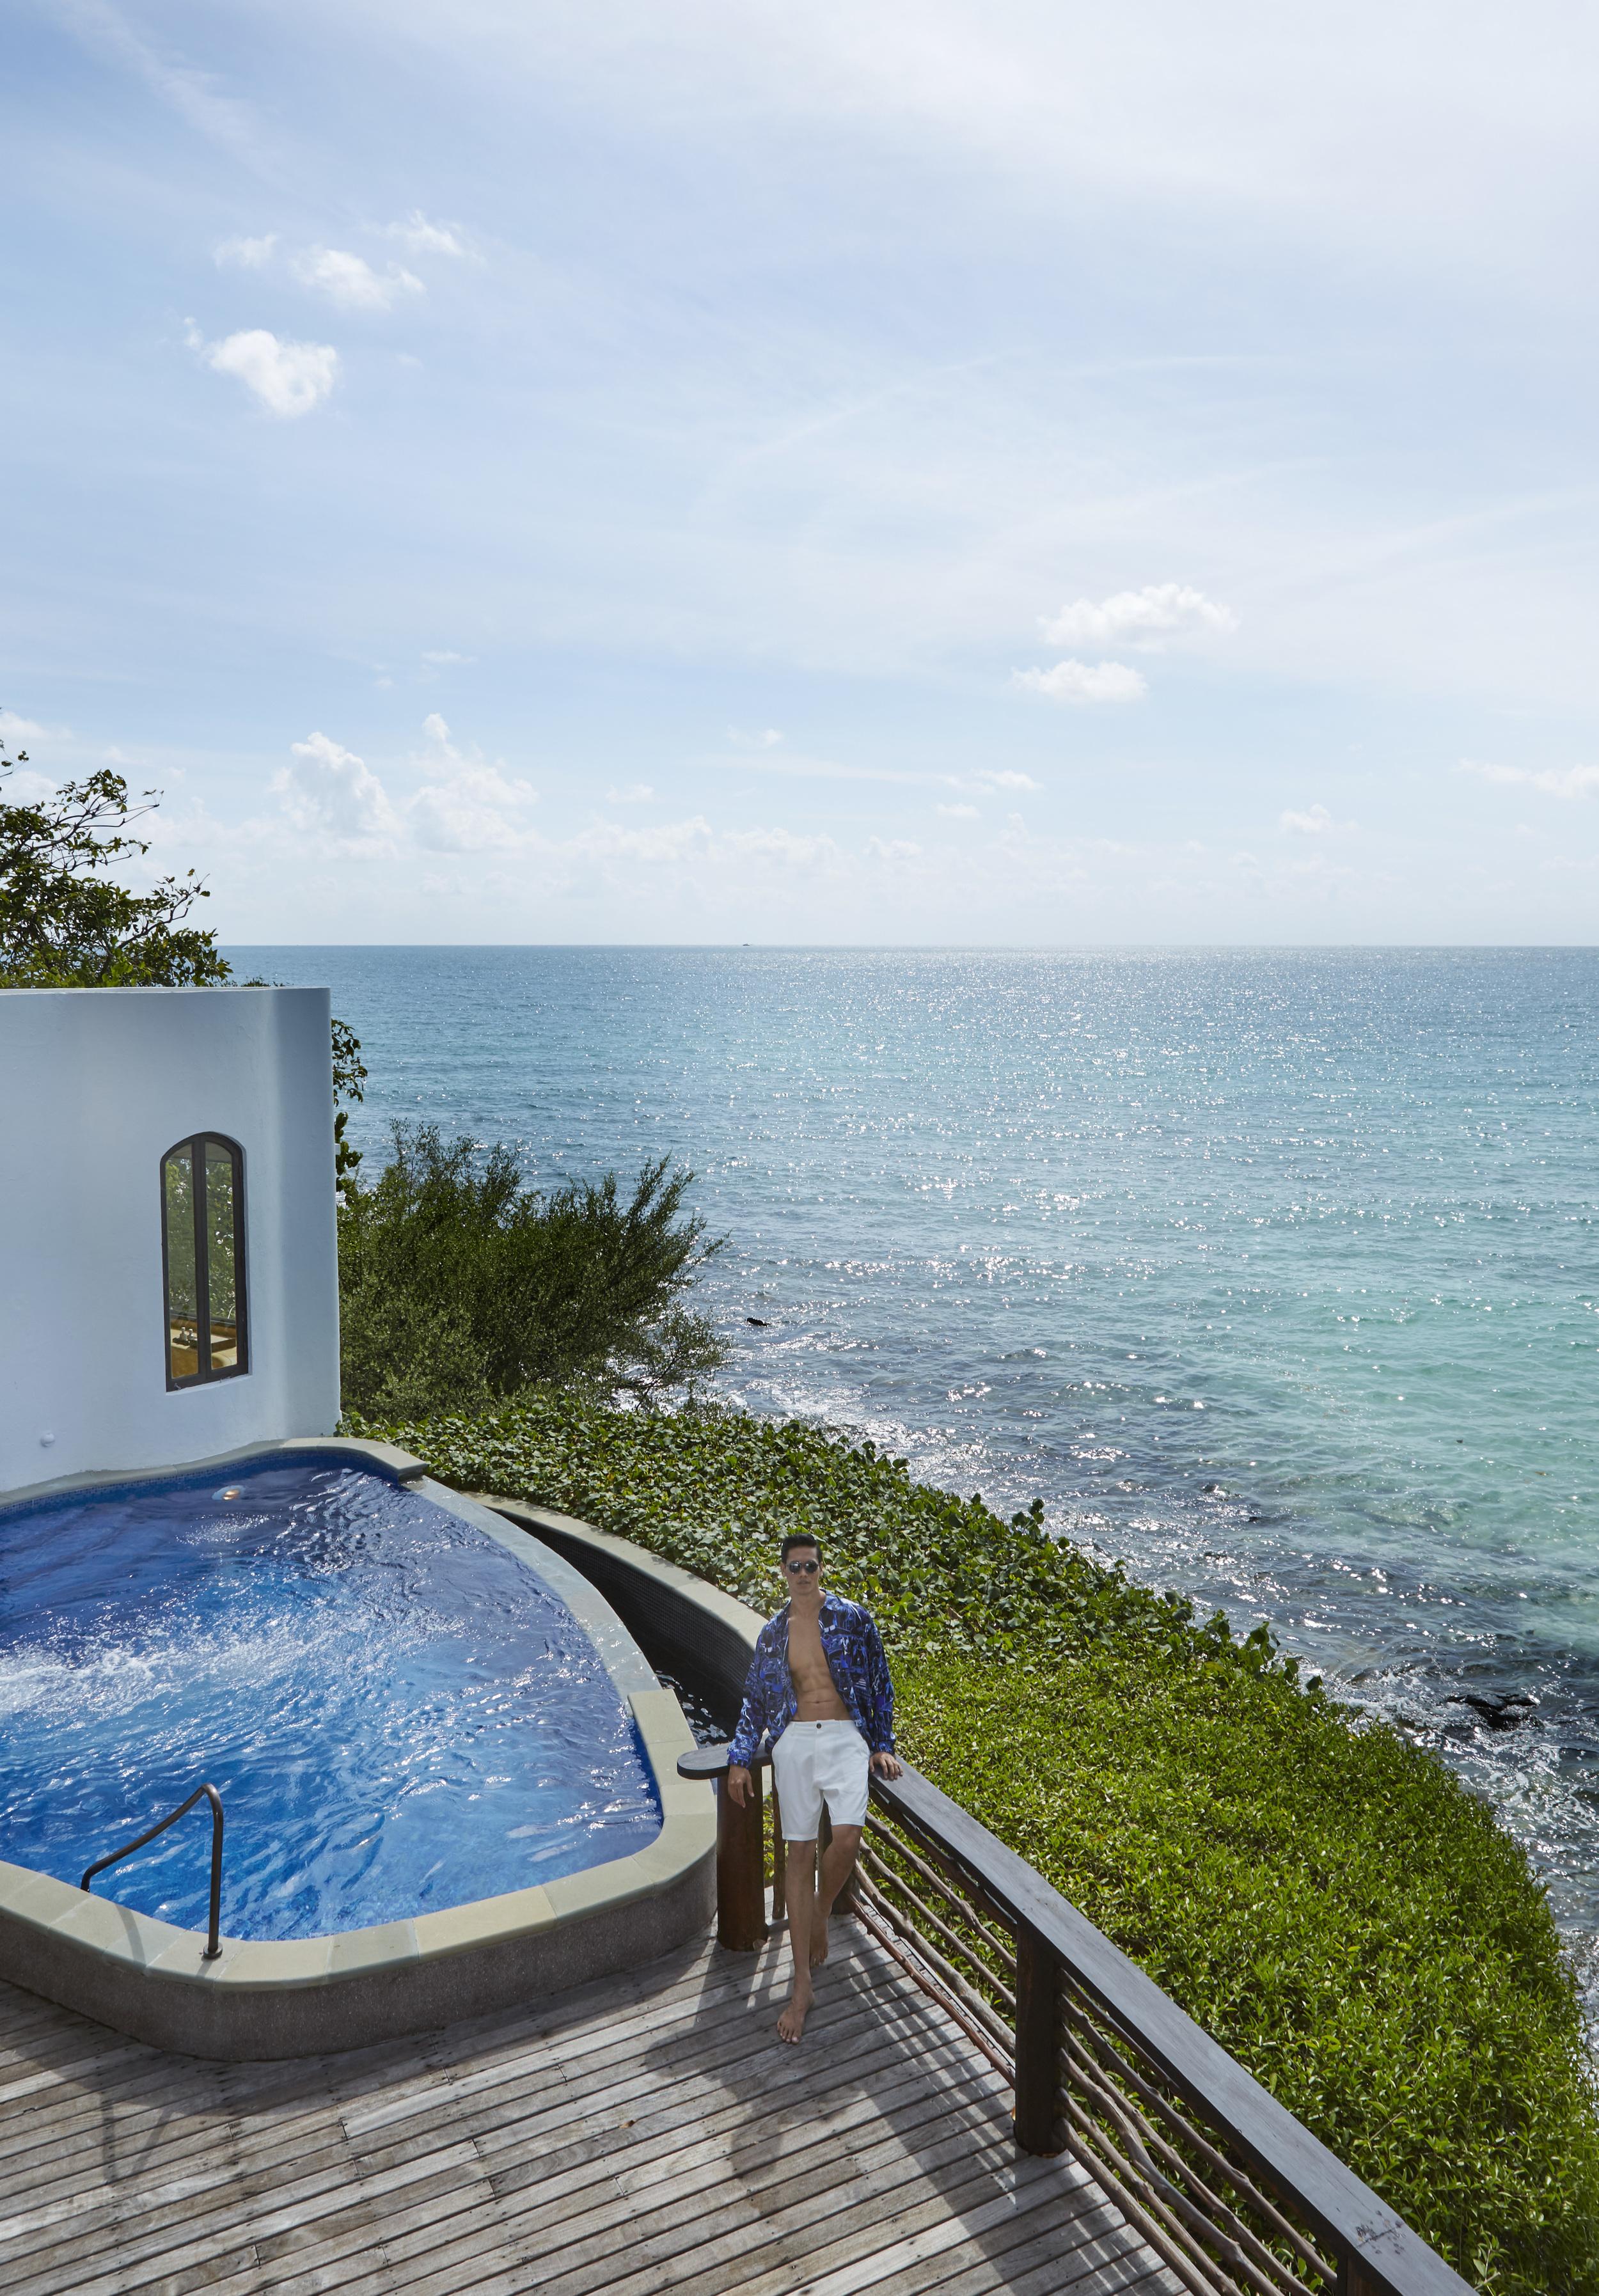 Paradee Resort, Samed Island  shirt : Emilio Pucci / short : Armani Exchange